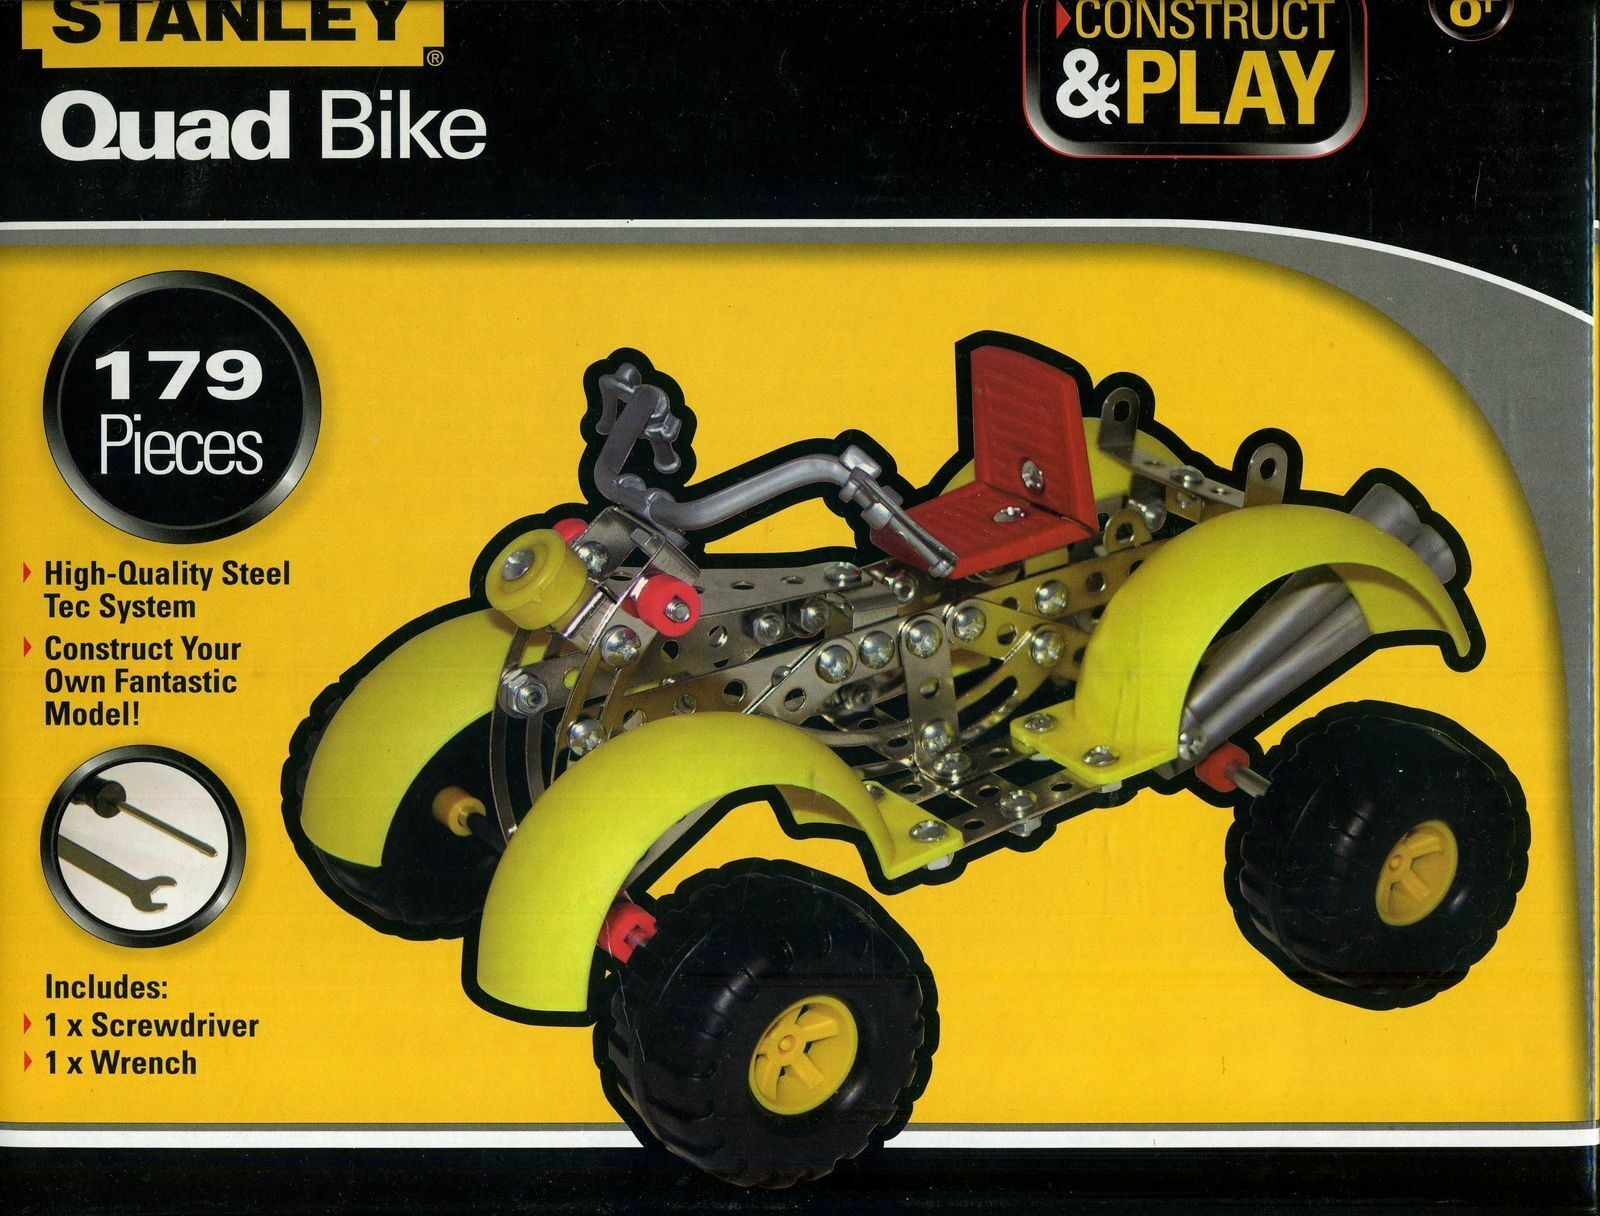 NEW - Stanley Construct & Play Quad Bike 179 Piece Set